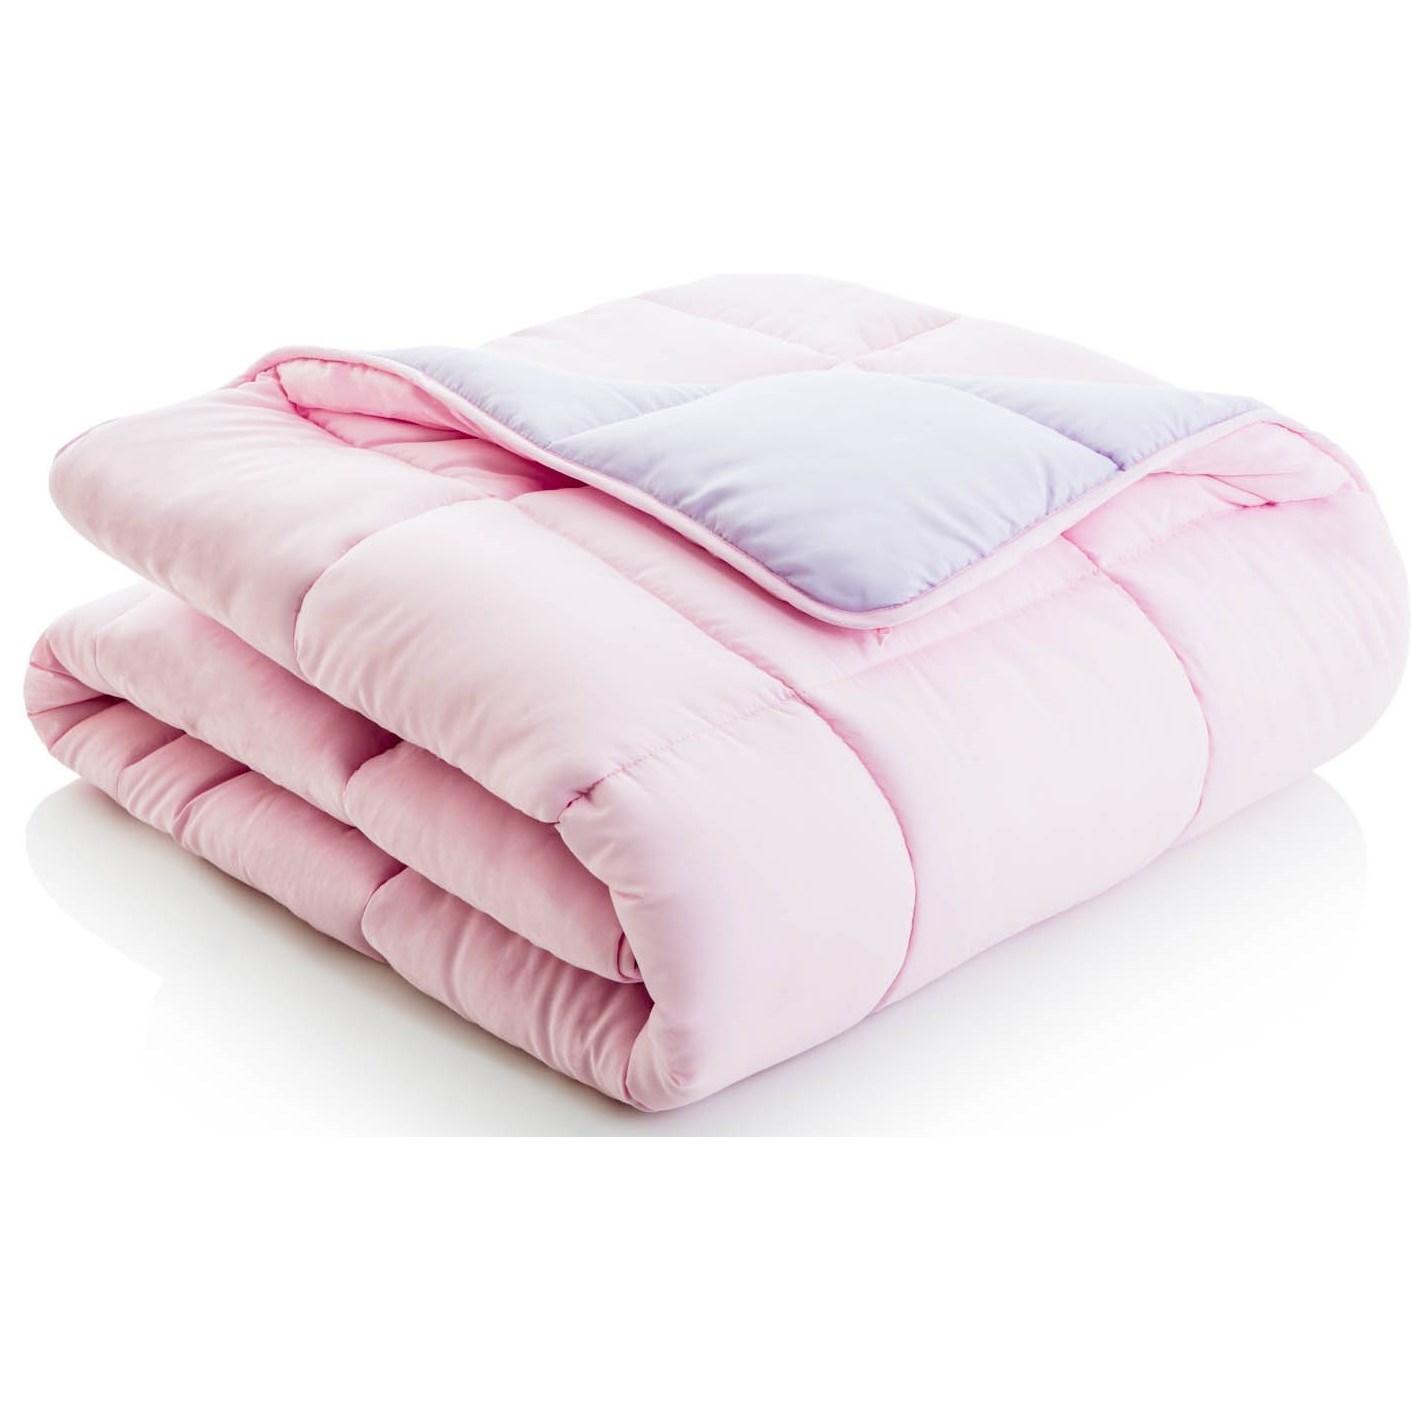 Malouf Reversible Bed in a Bag Split Queen Reversible Bed in a Bag - Item Number: MA01SQLIBHBB